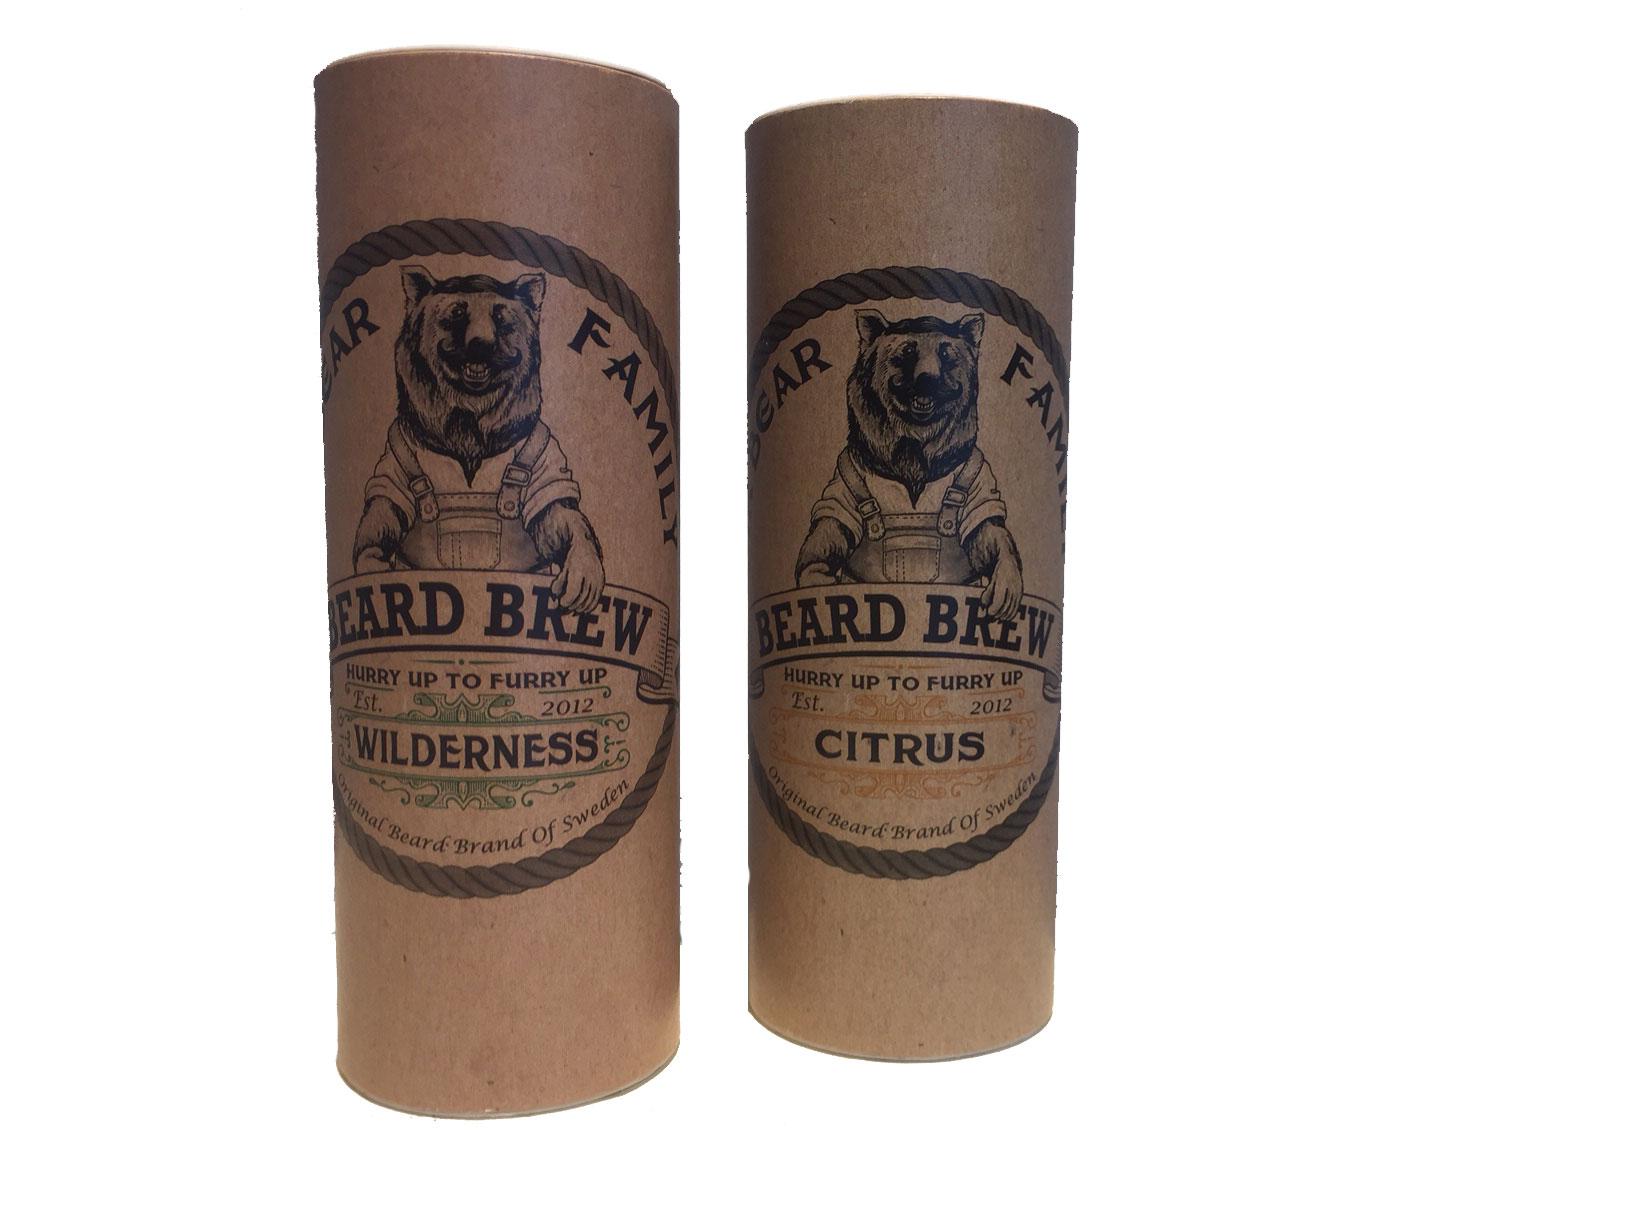 Beard Brew Wilderness & Citrus